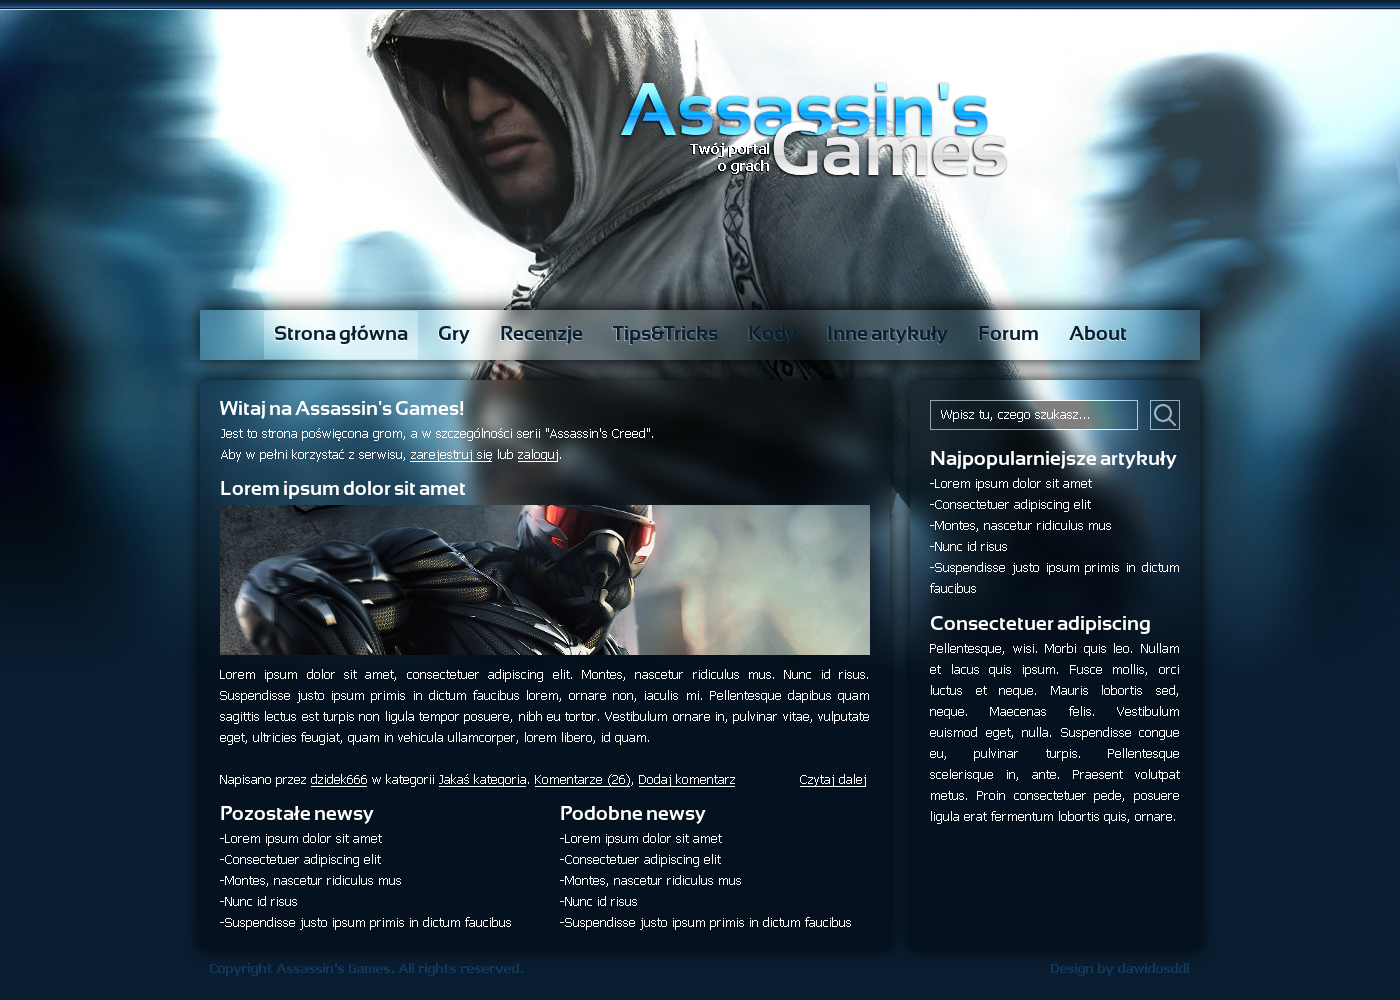 Assassin's Games